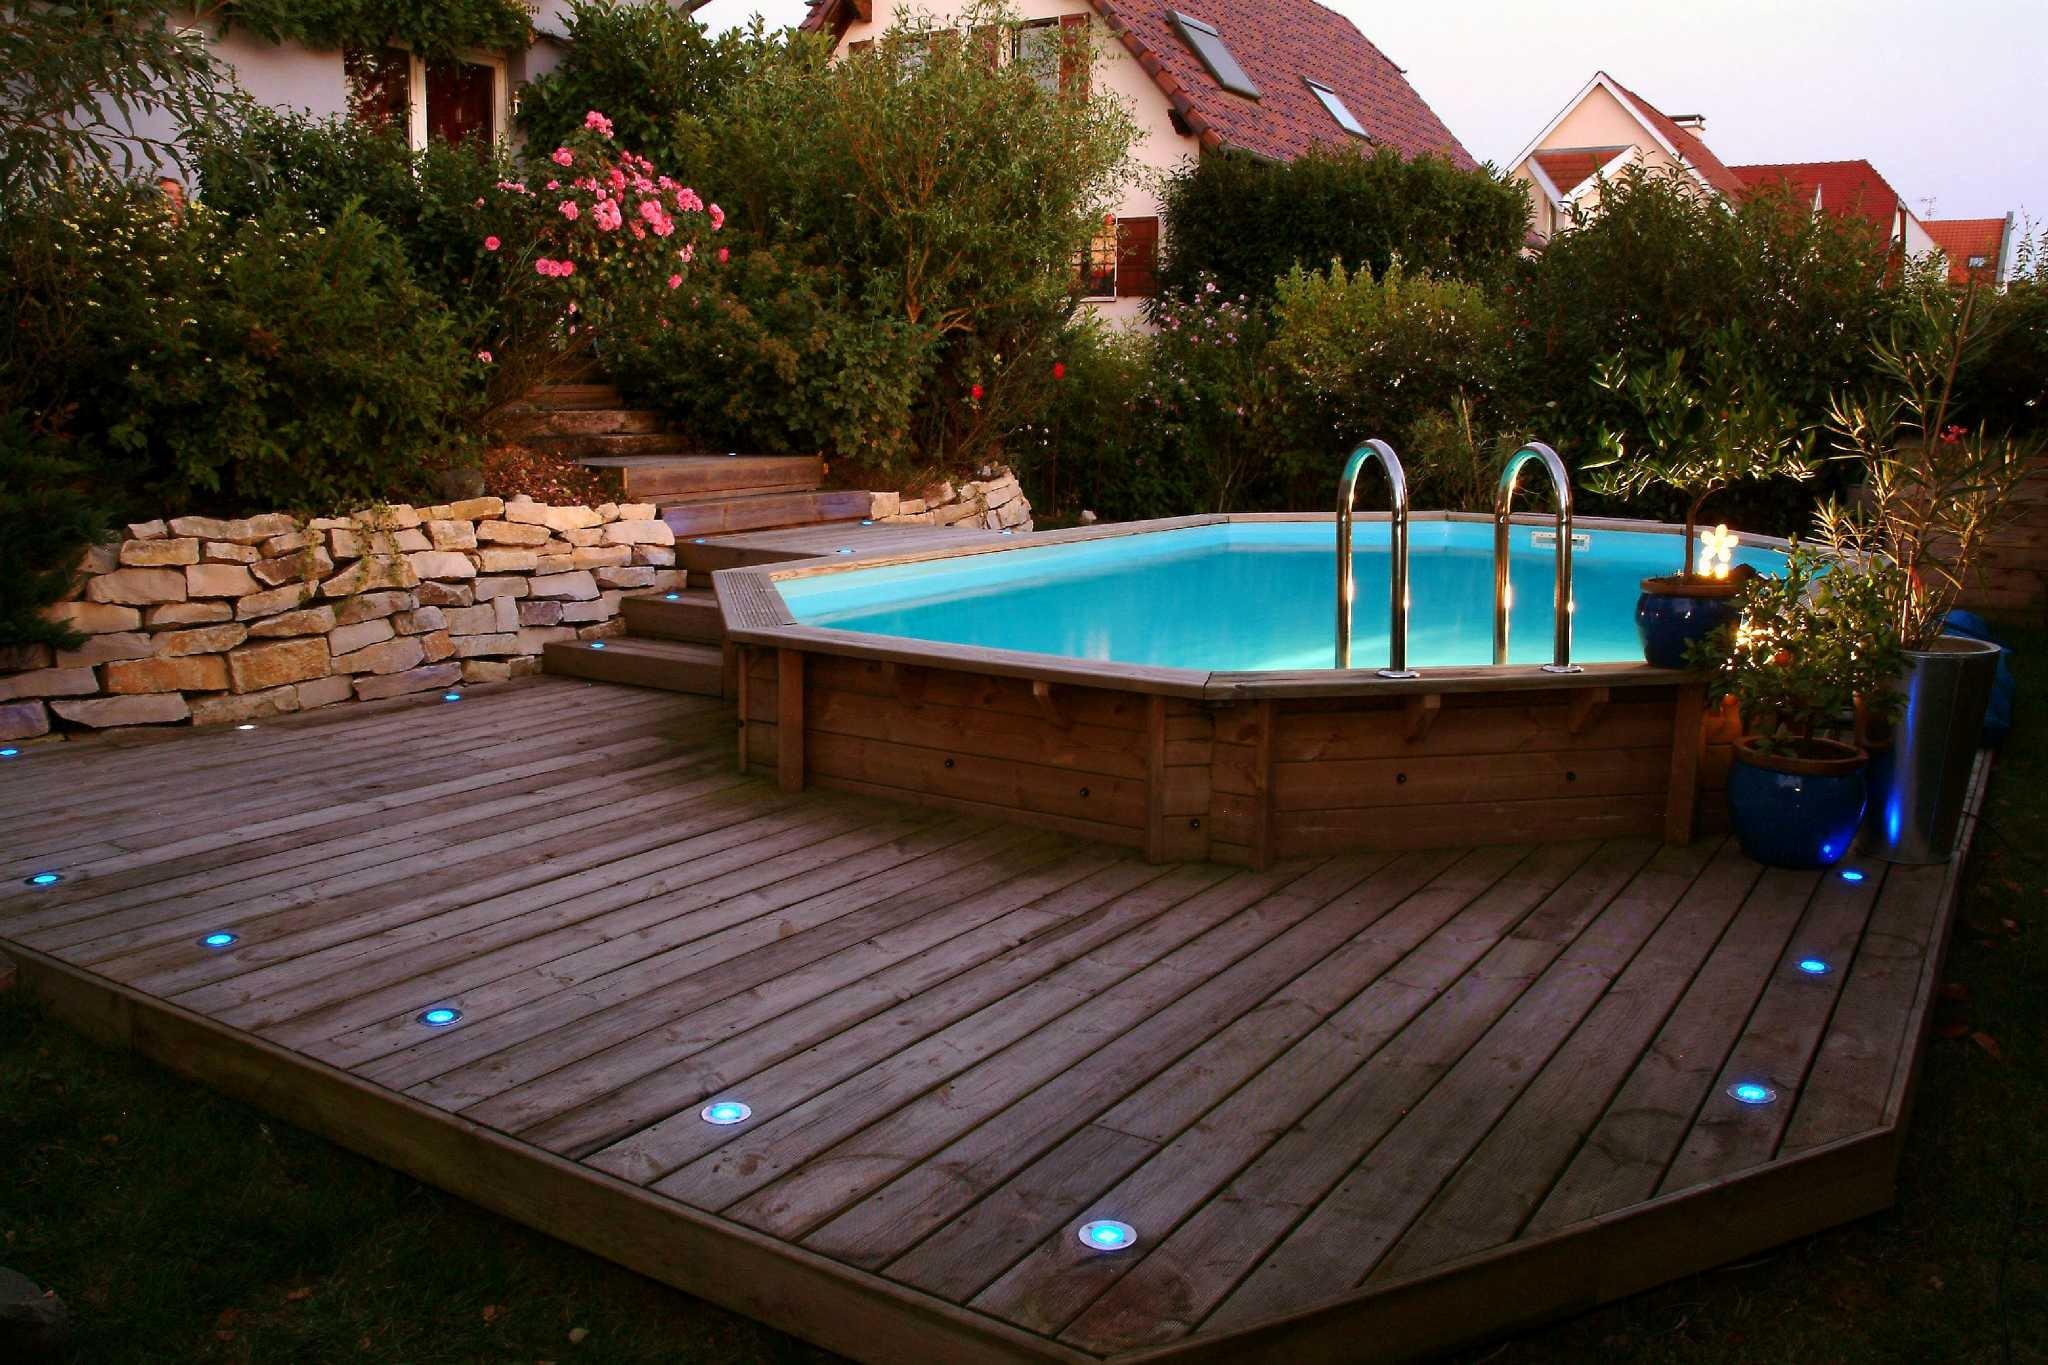 deco piscine en bois